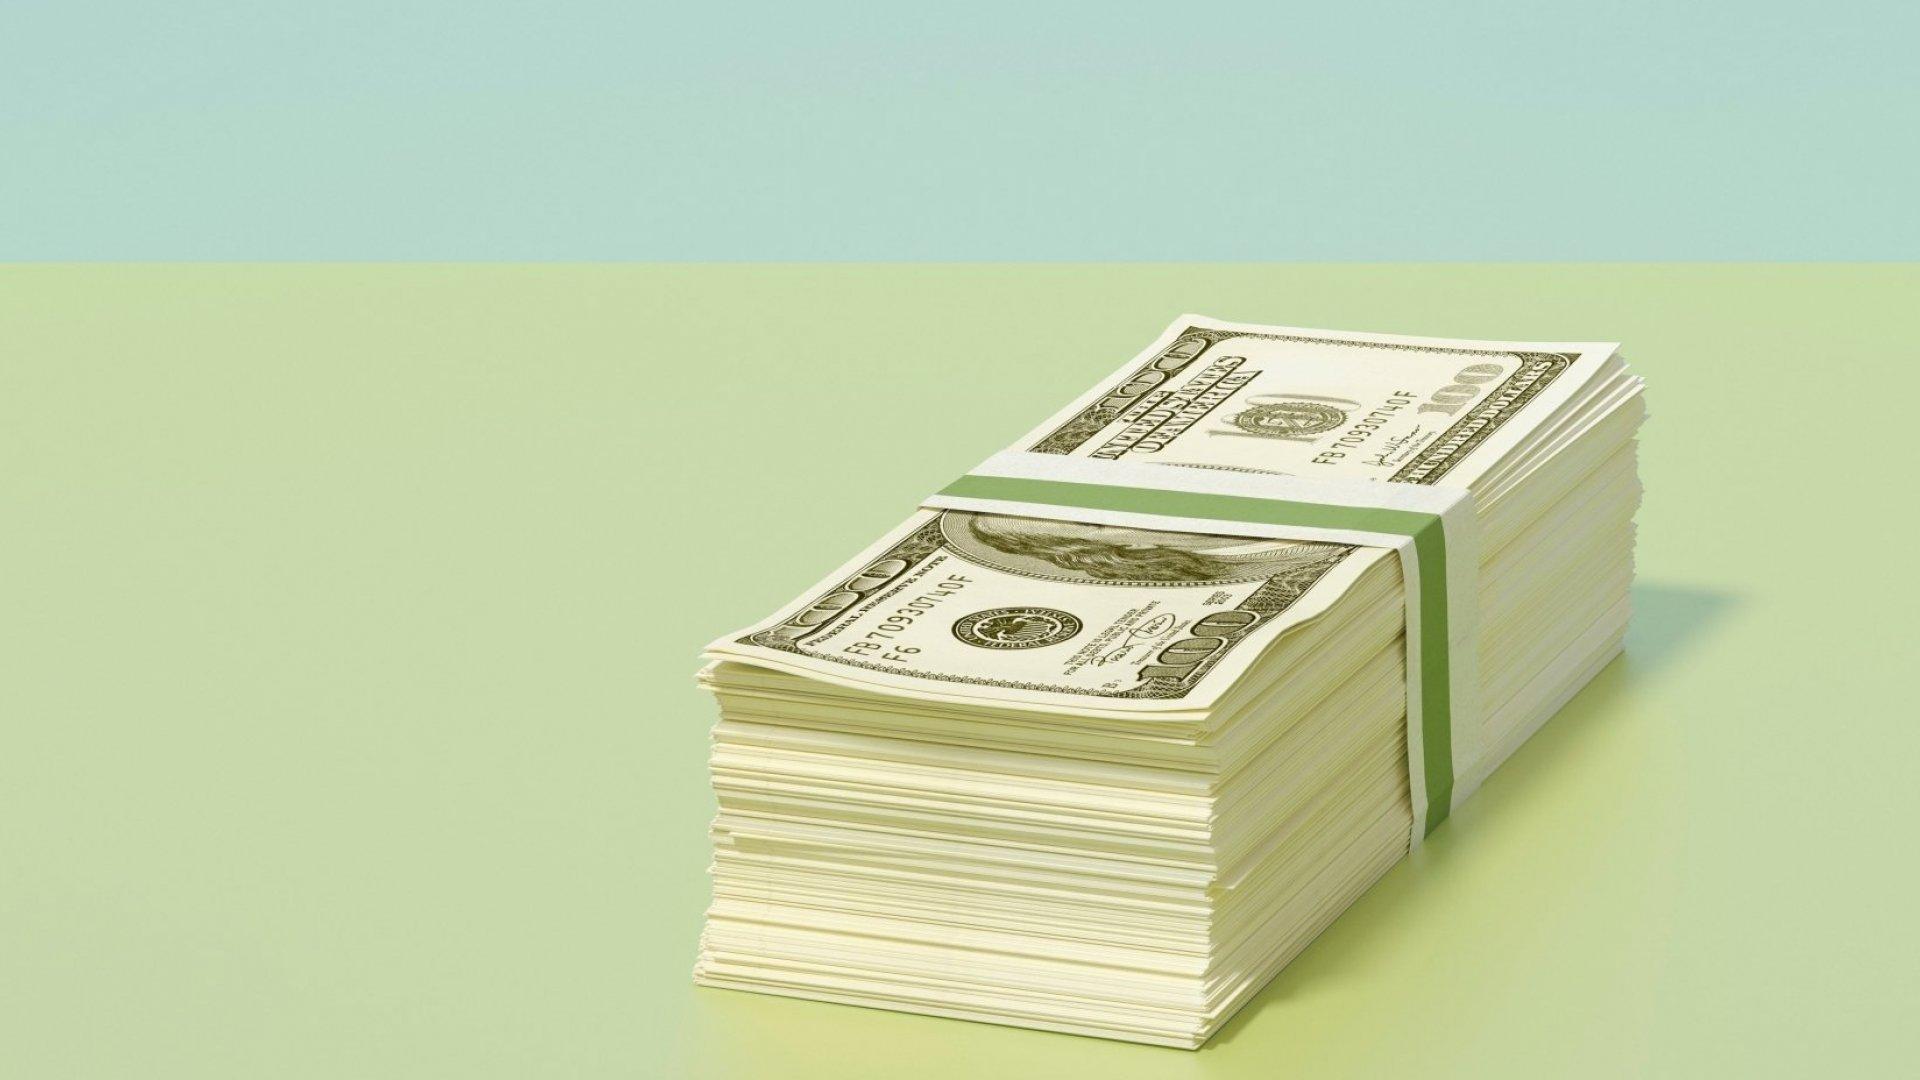 The Best Way to Manage Cash Flow Proves Elusive: Survey